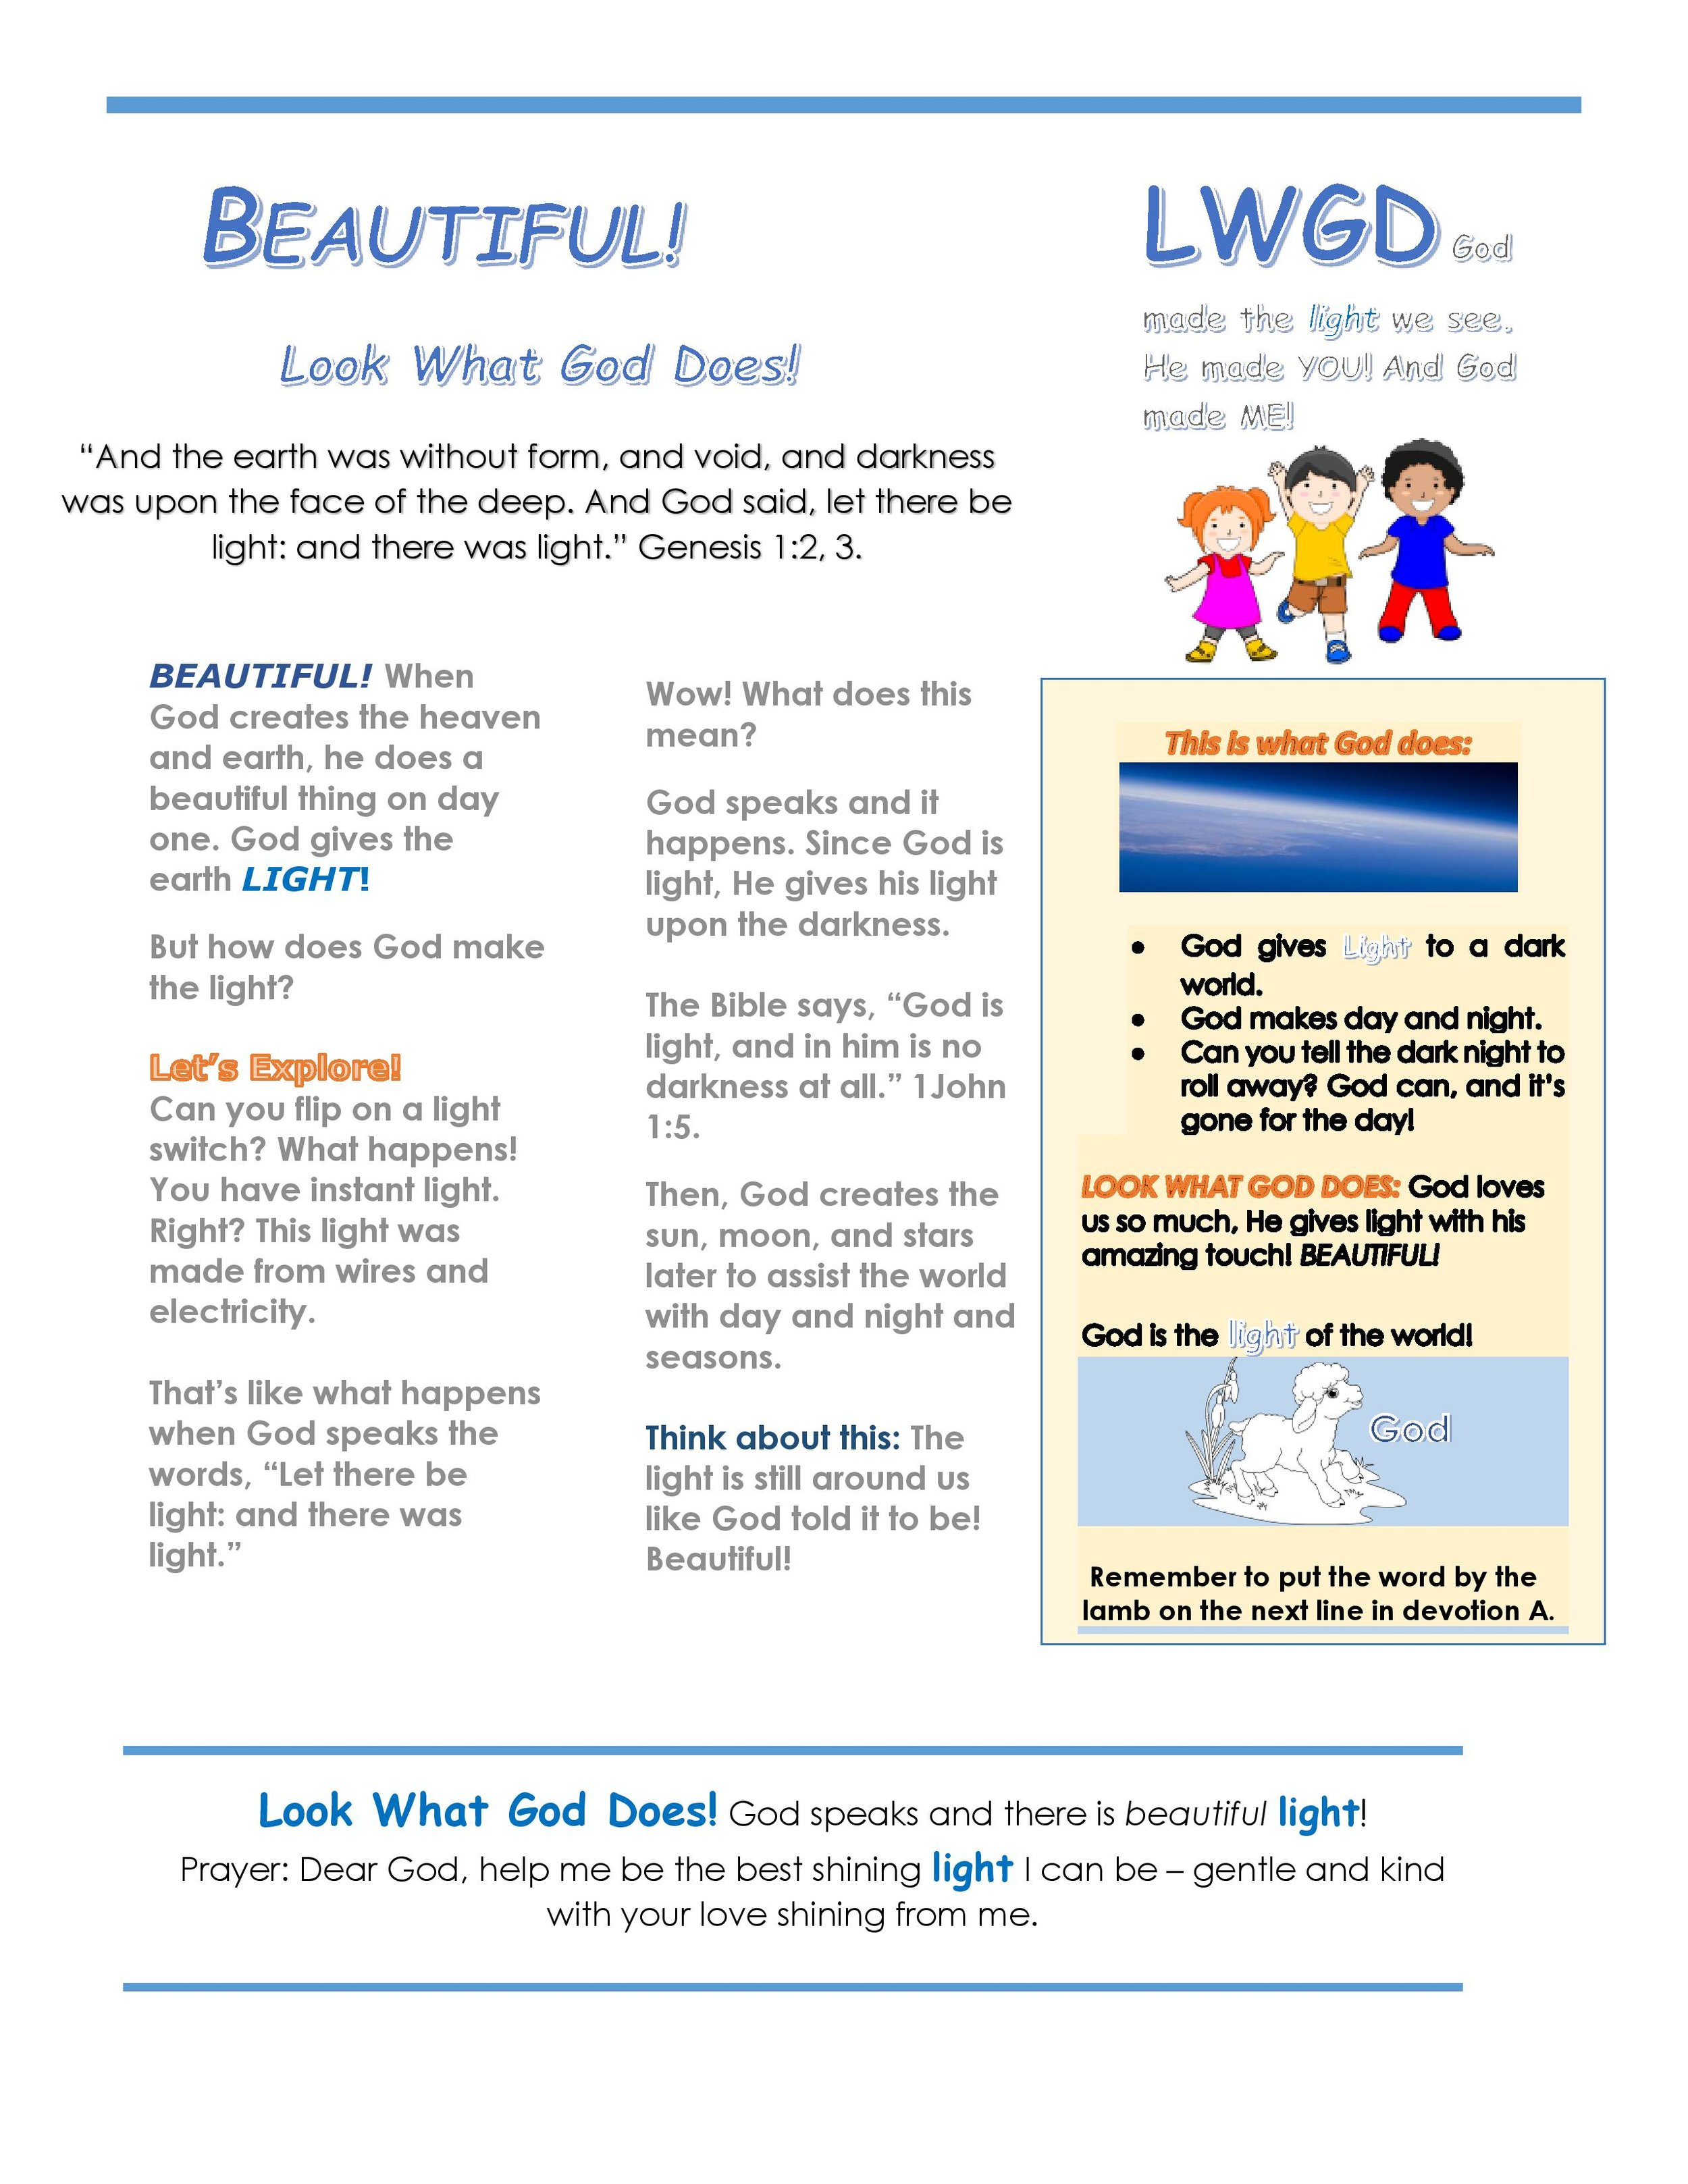 B-Beautiful LIGHT LWGD-page-001.jpg